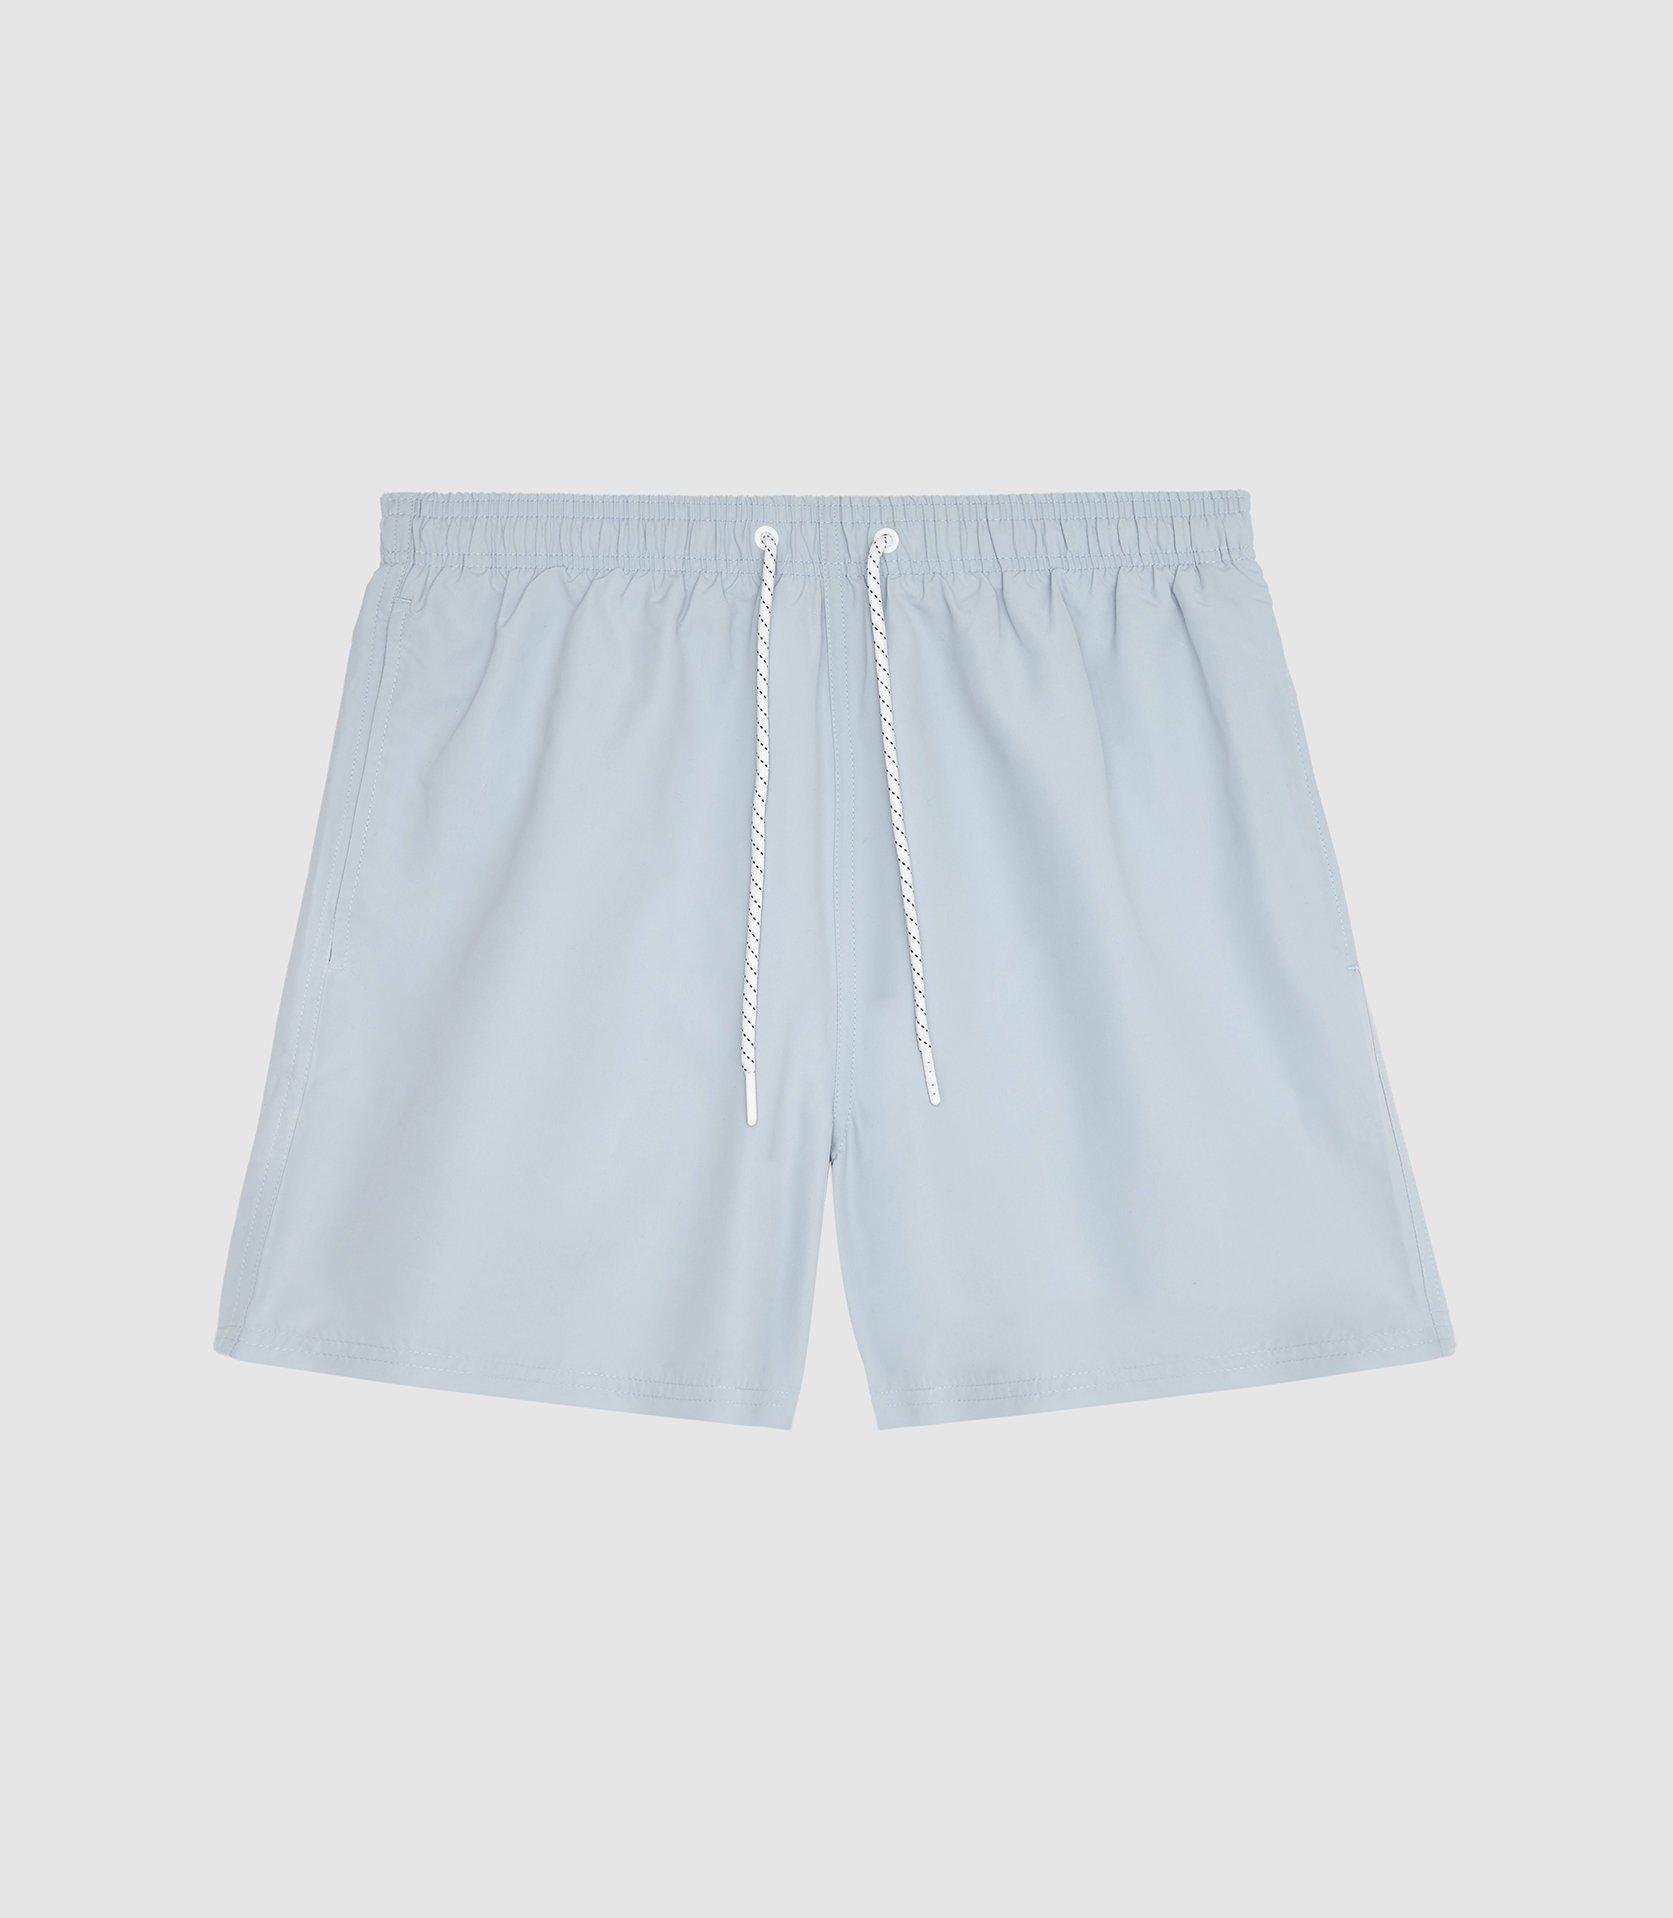 Reiss Synthetic Sonar - Drawstring Swim Shorts in Soft Blue (Blue) for Men